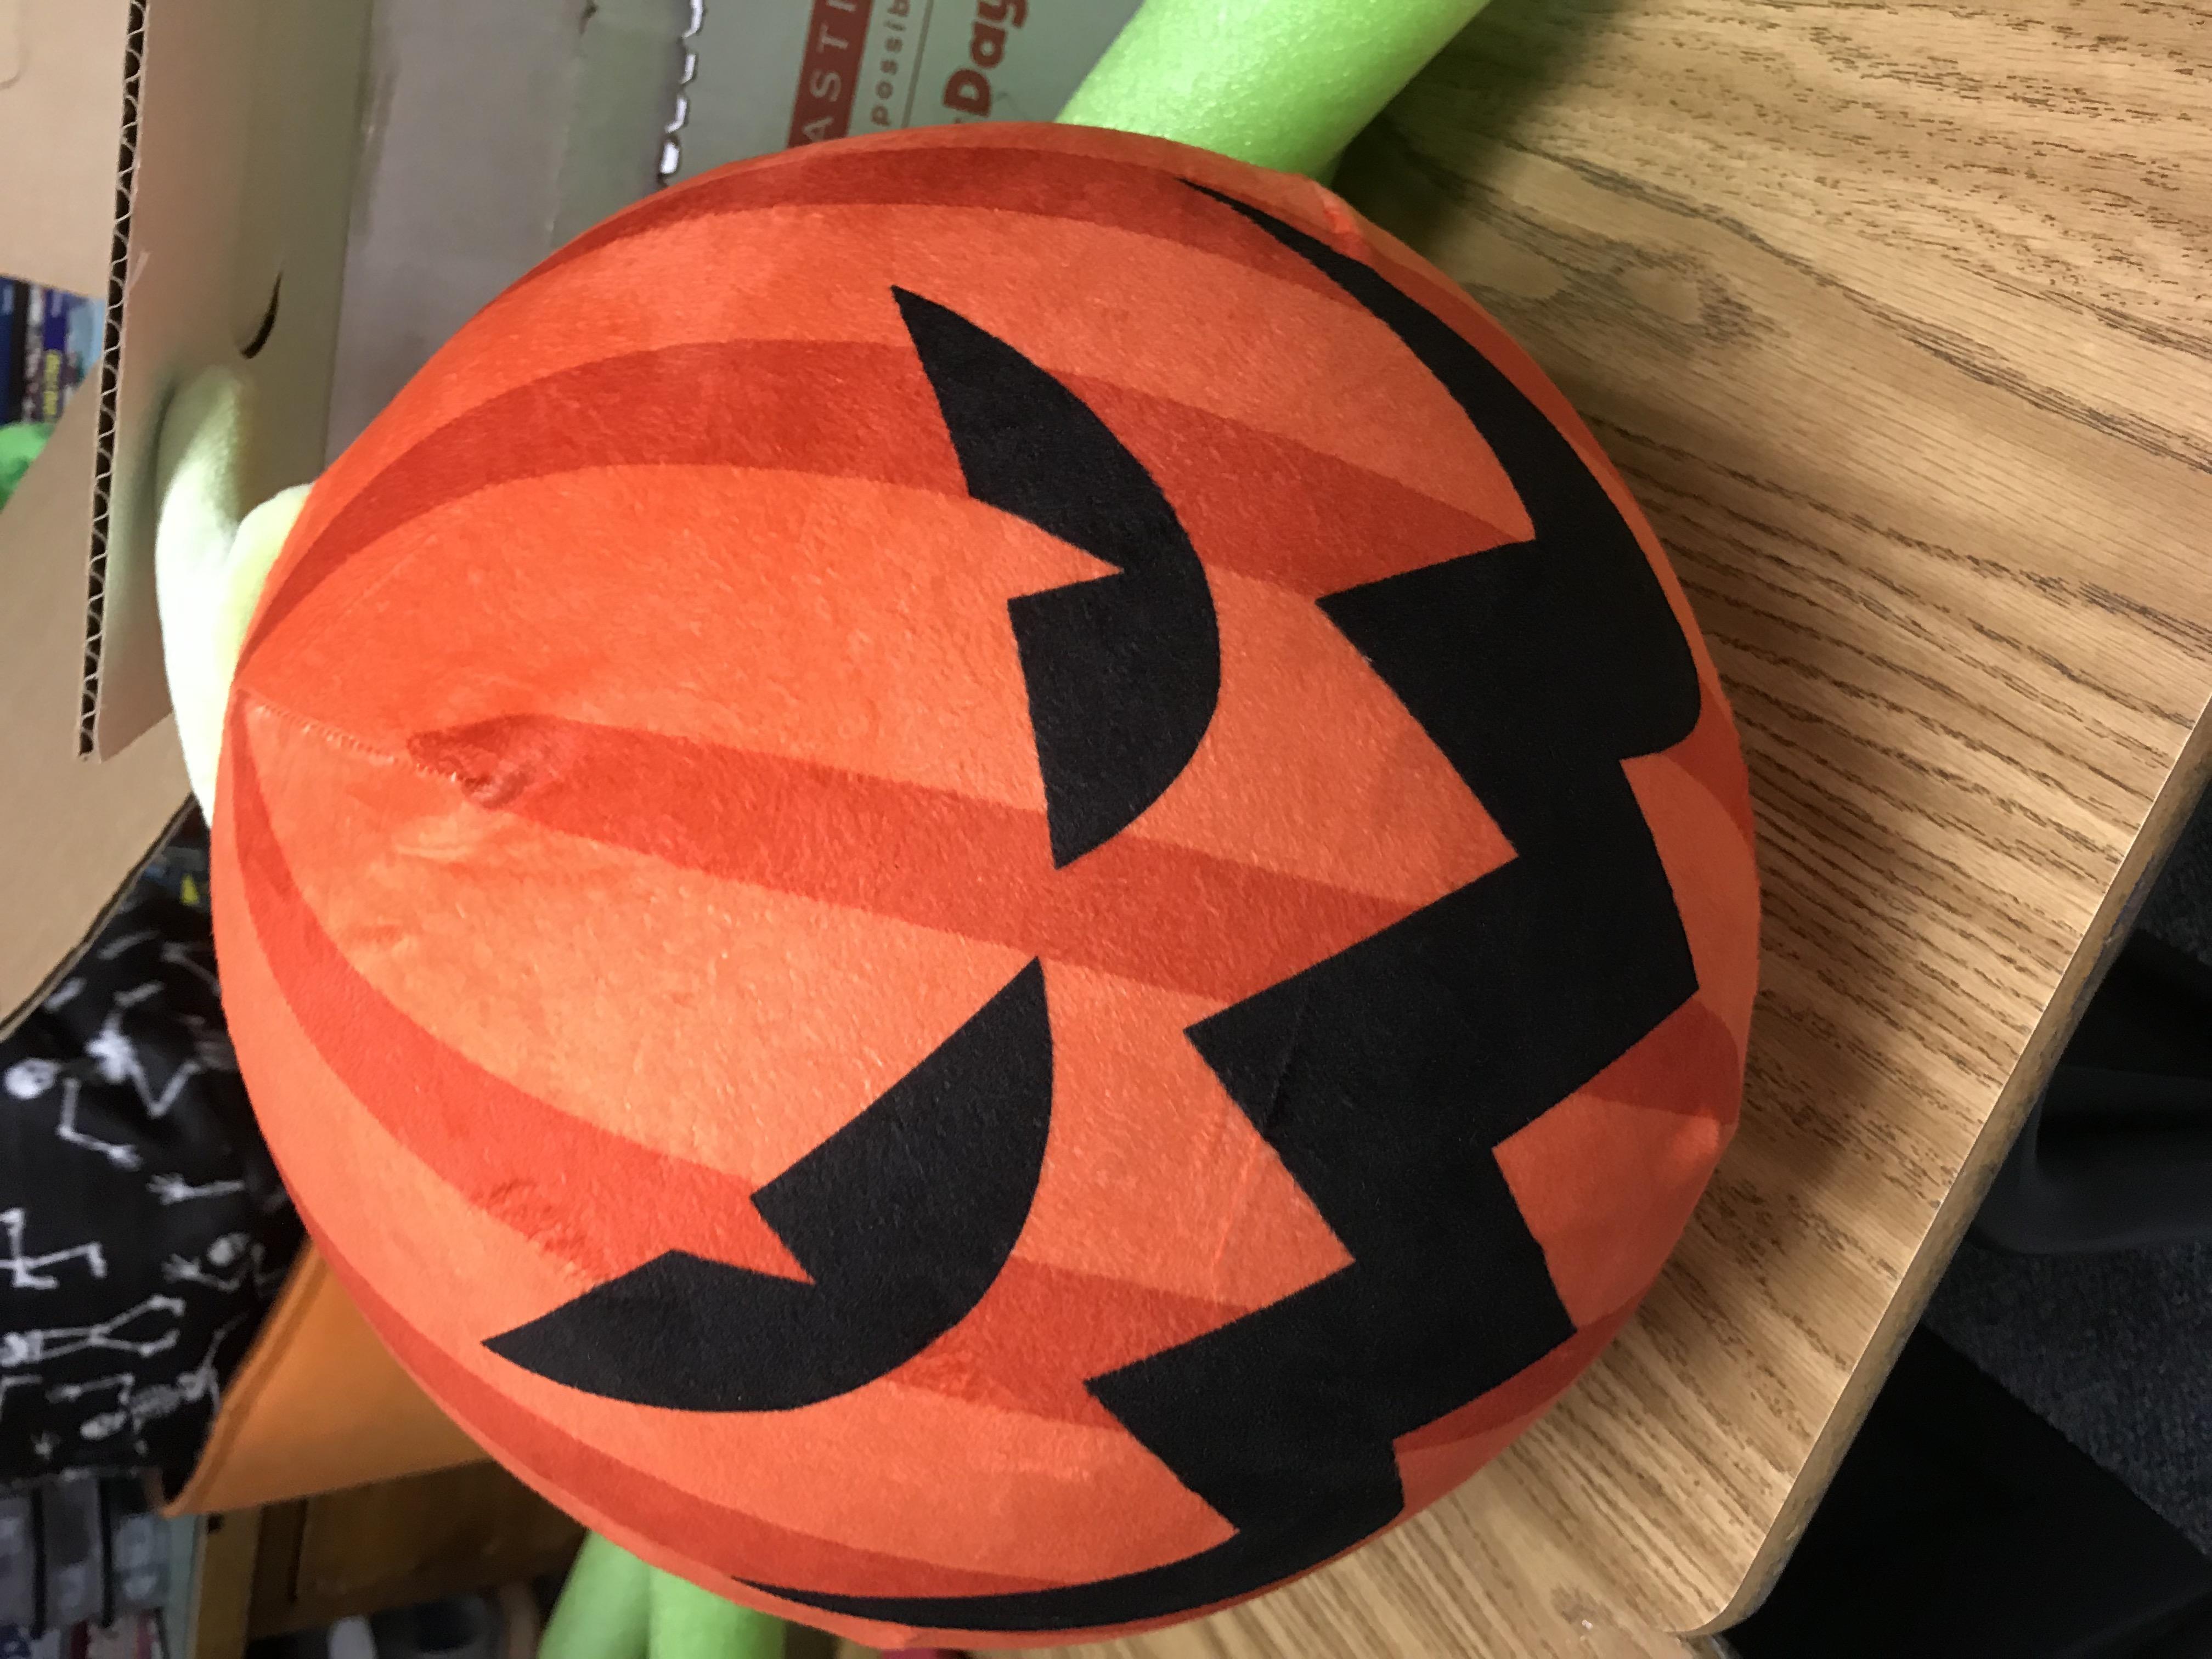 Jack-o-Lantern ball